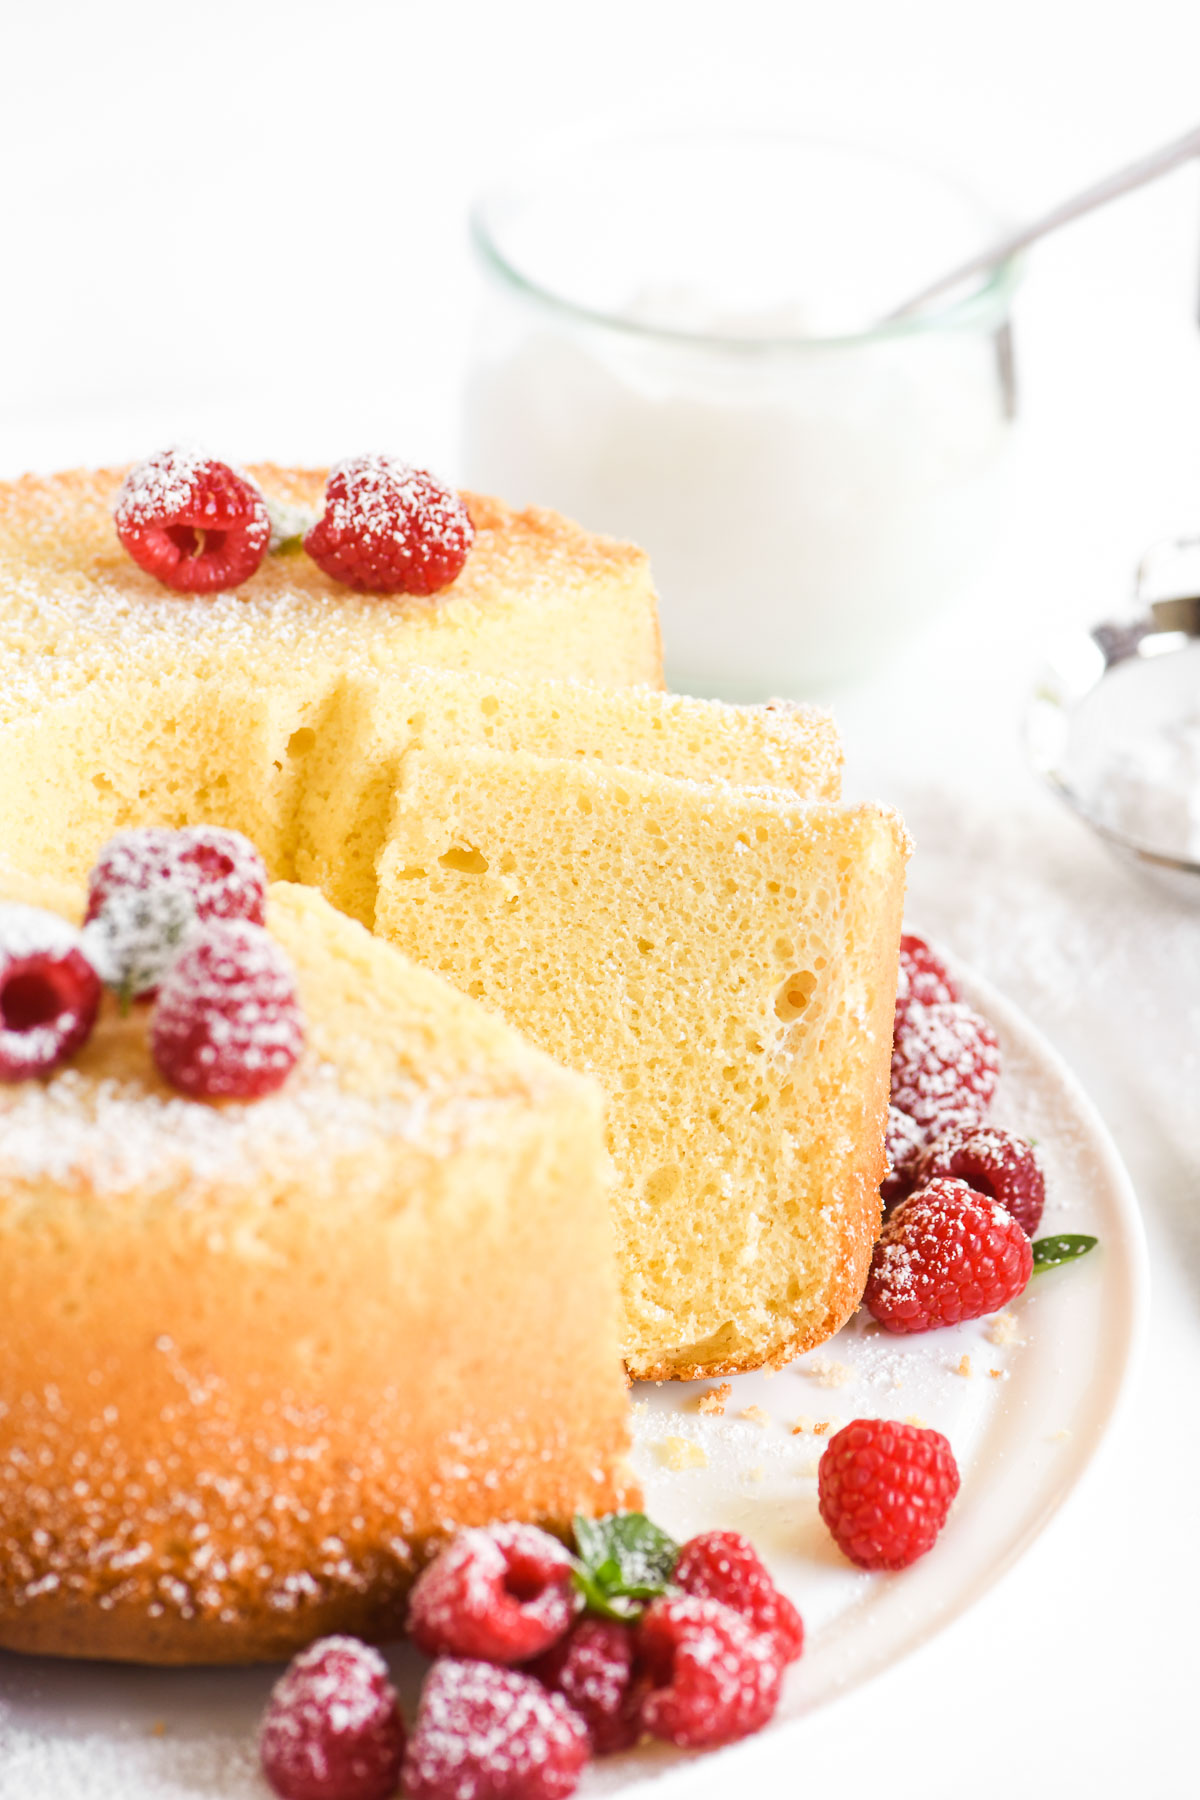 lemon chiffon cake dusted with powdered sugar